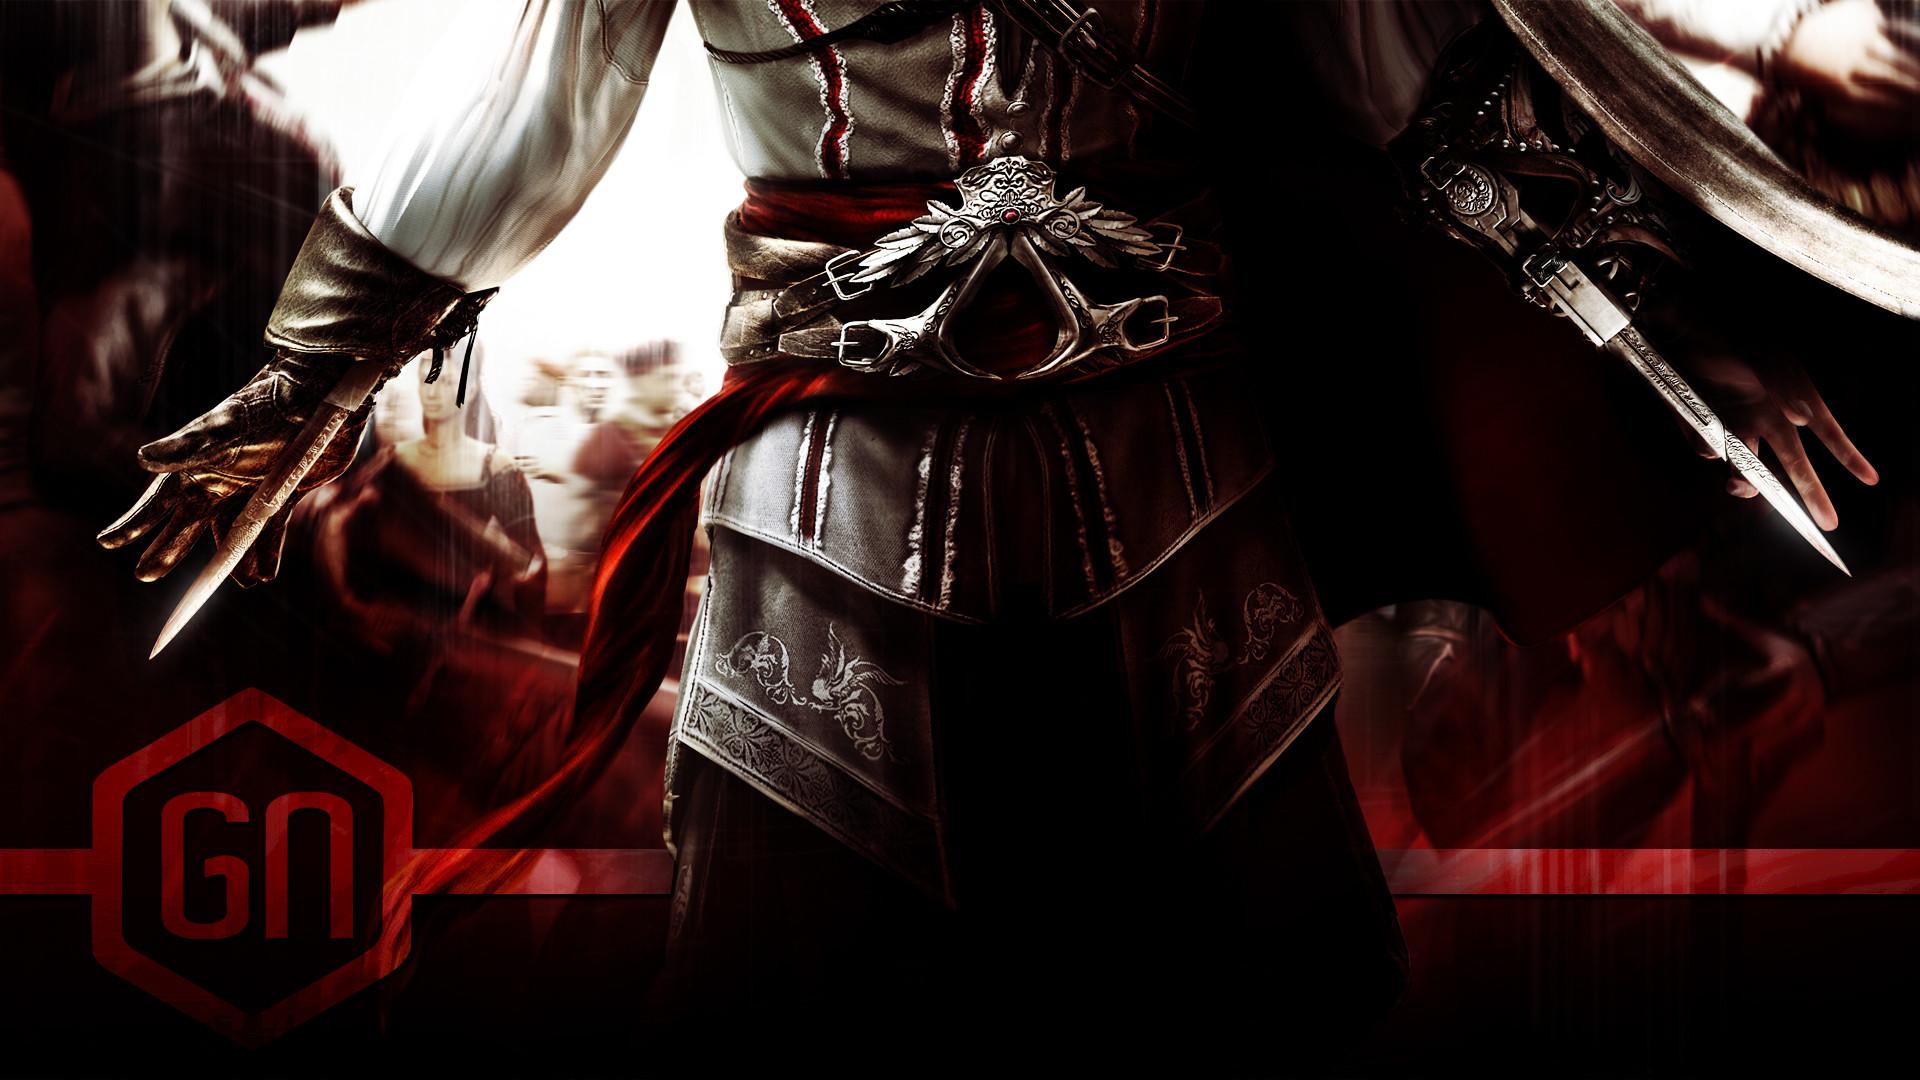 Assassins Creed 2 Wallpaper (82+ Images